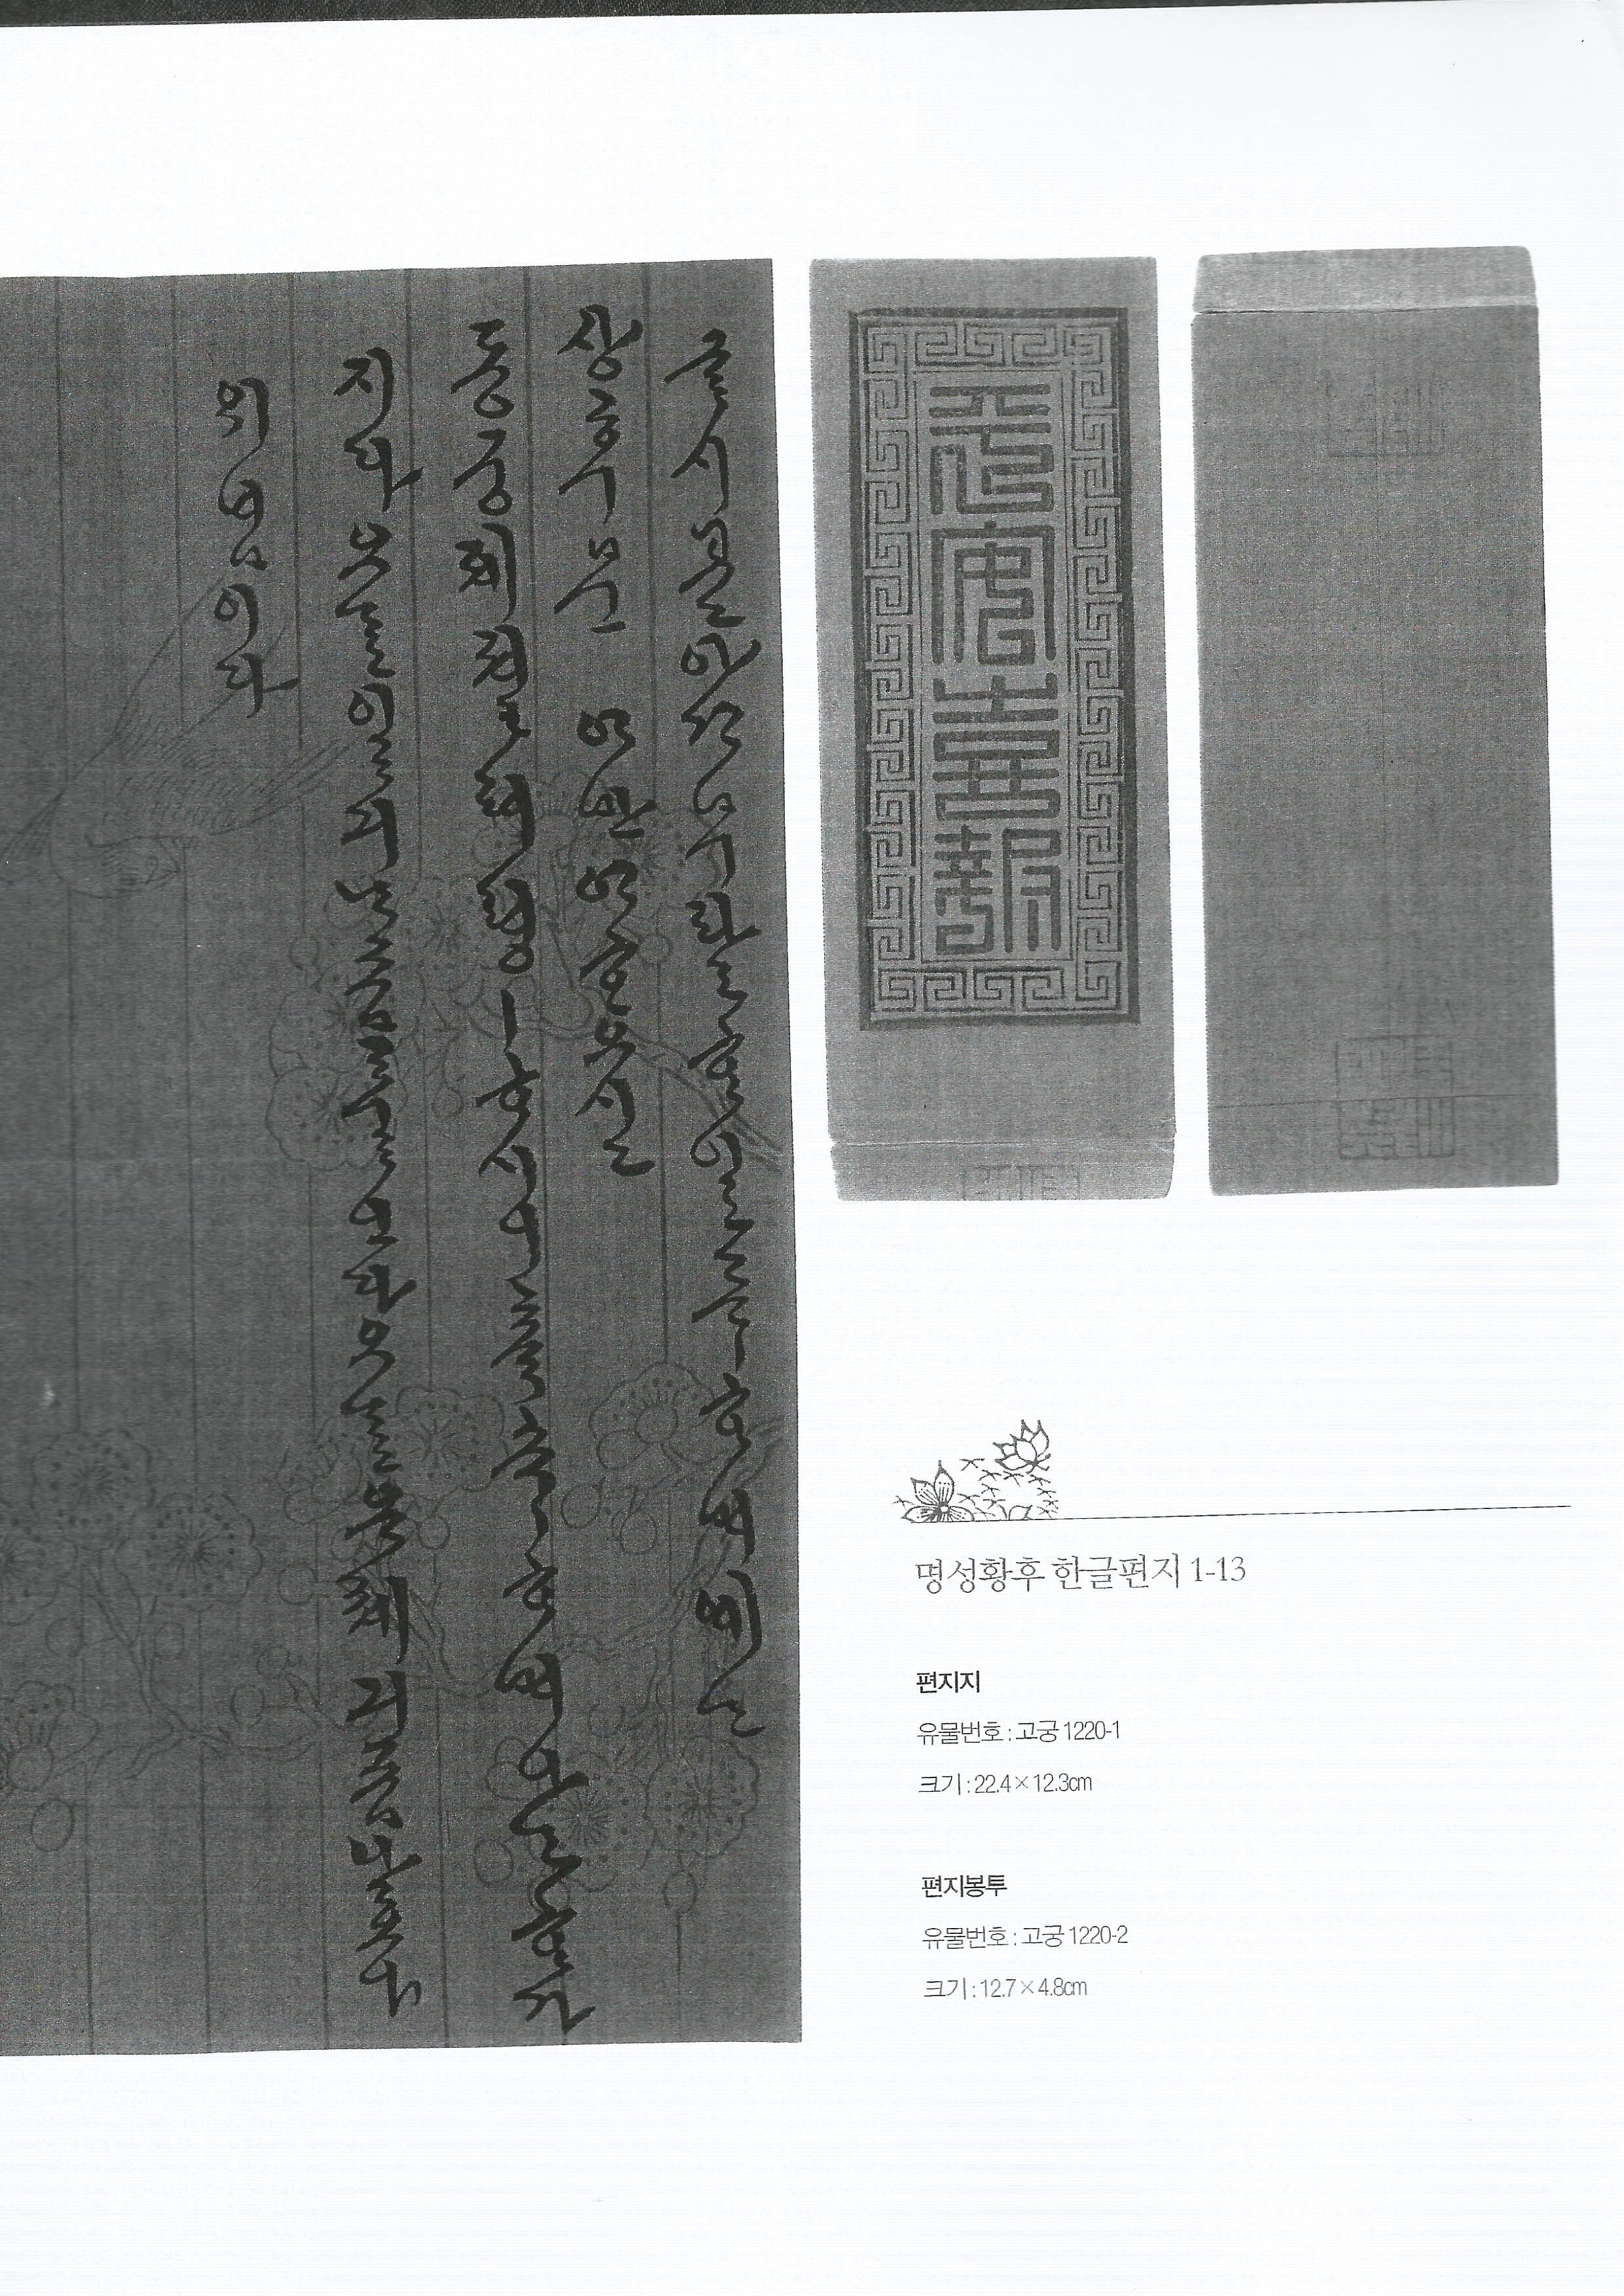 t116B r1 이충근 001 명성황후 한글편지와 조선왕실의 시전지/ 국립고궁박물관 [편].